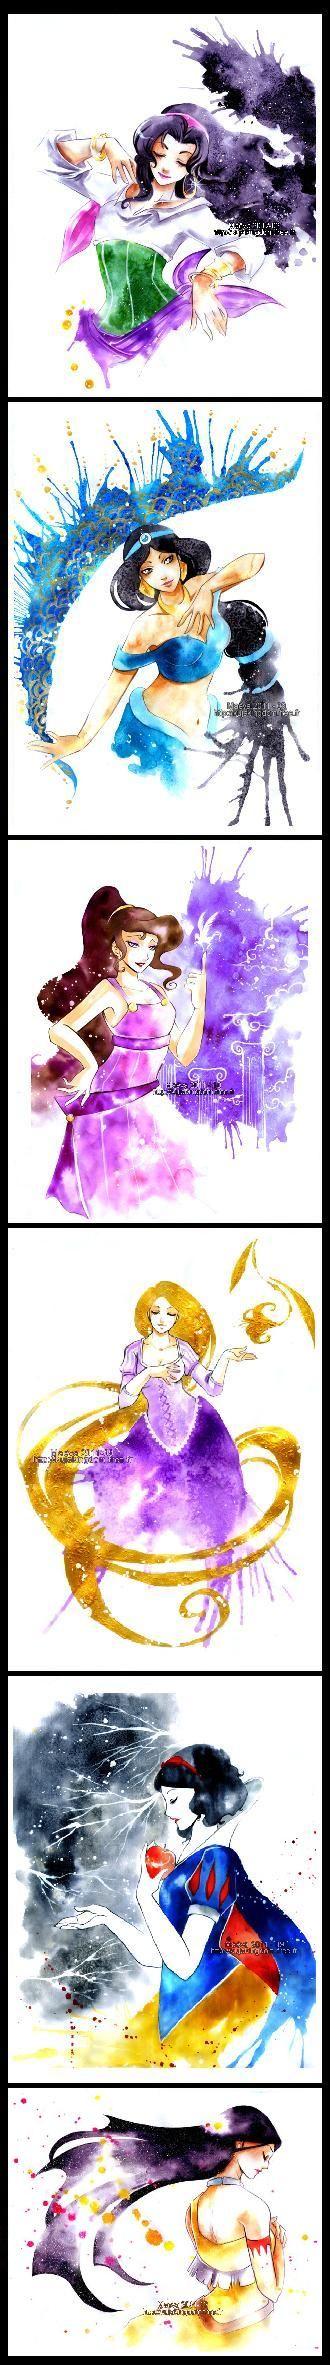 Beautiful! Really love Esmeralda!